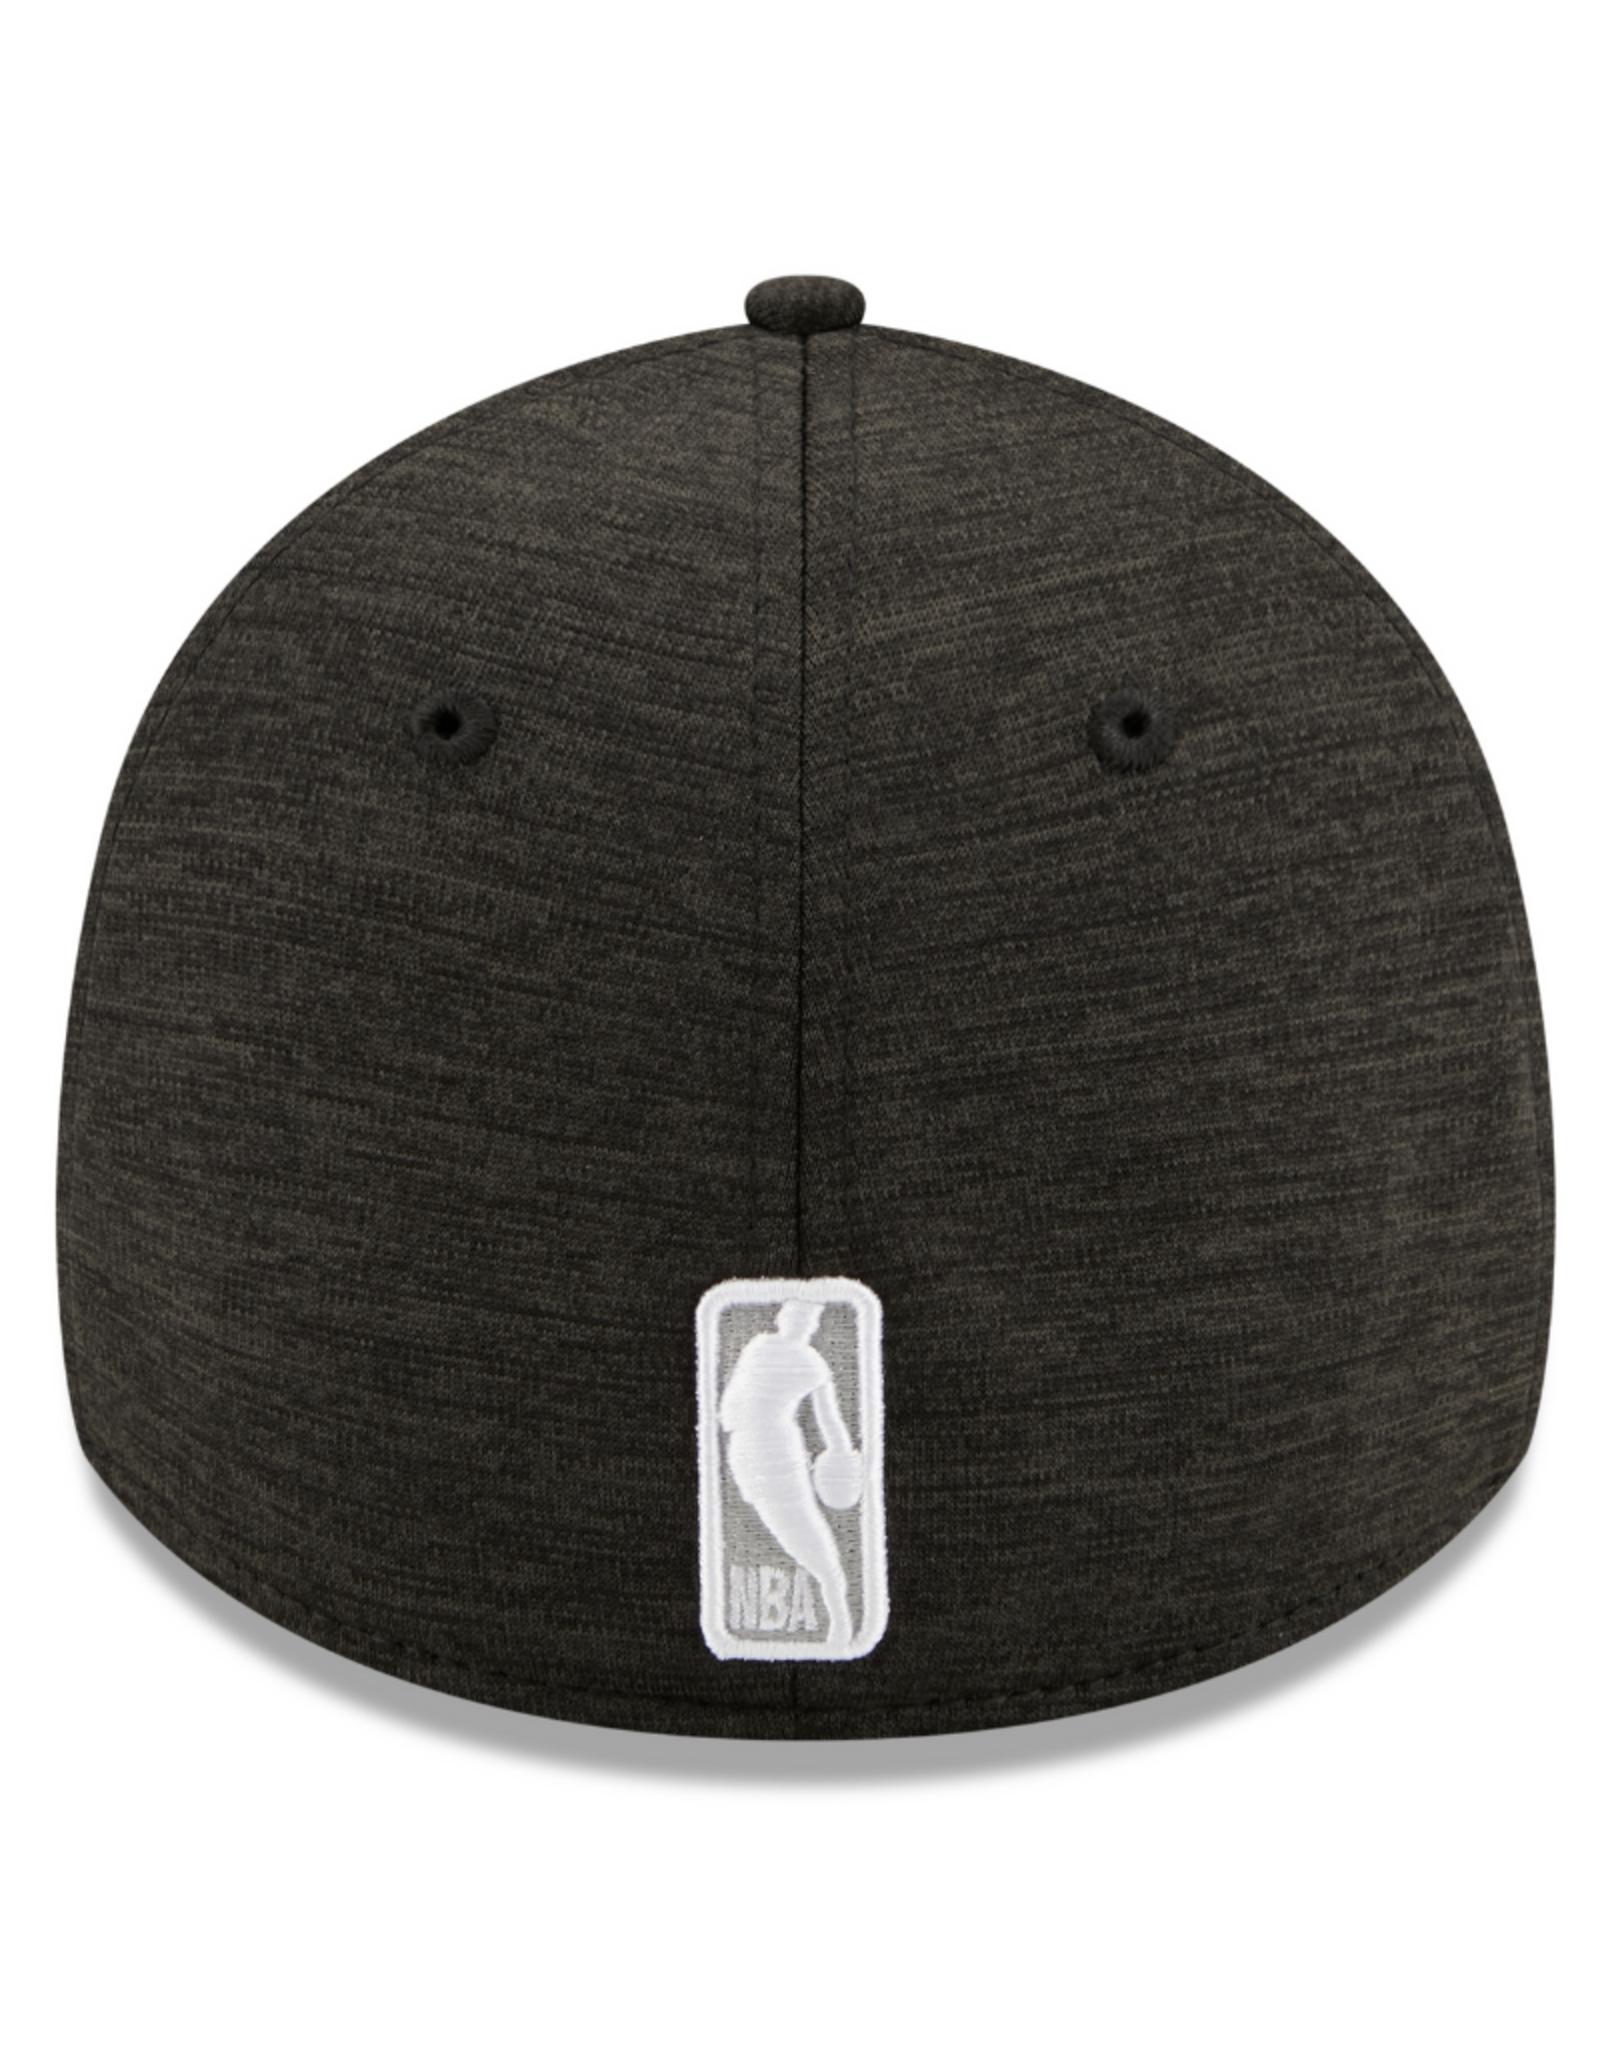 New Era Adult 39THIRTY Shadow B3 Hat Brooklyn Nets Black